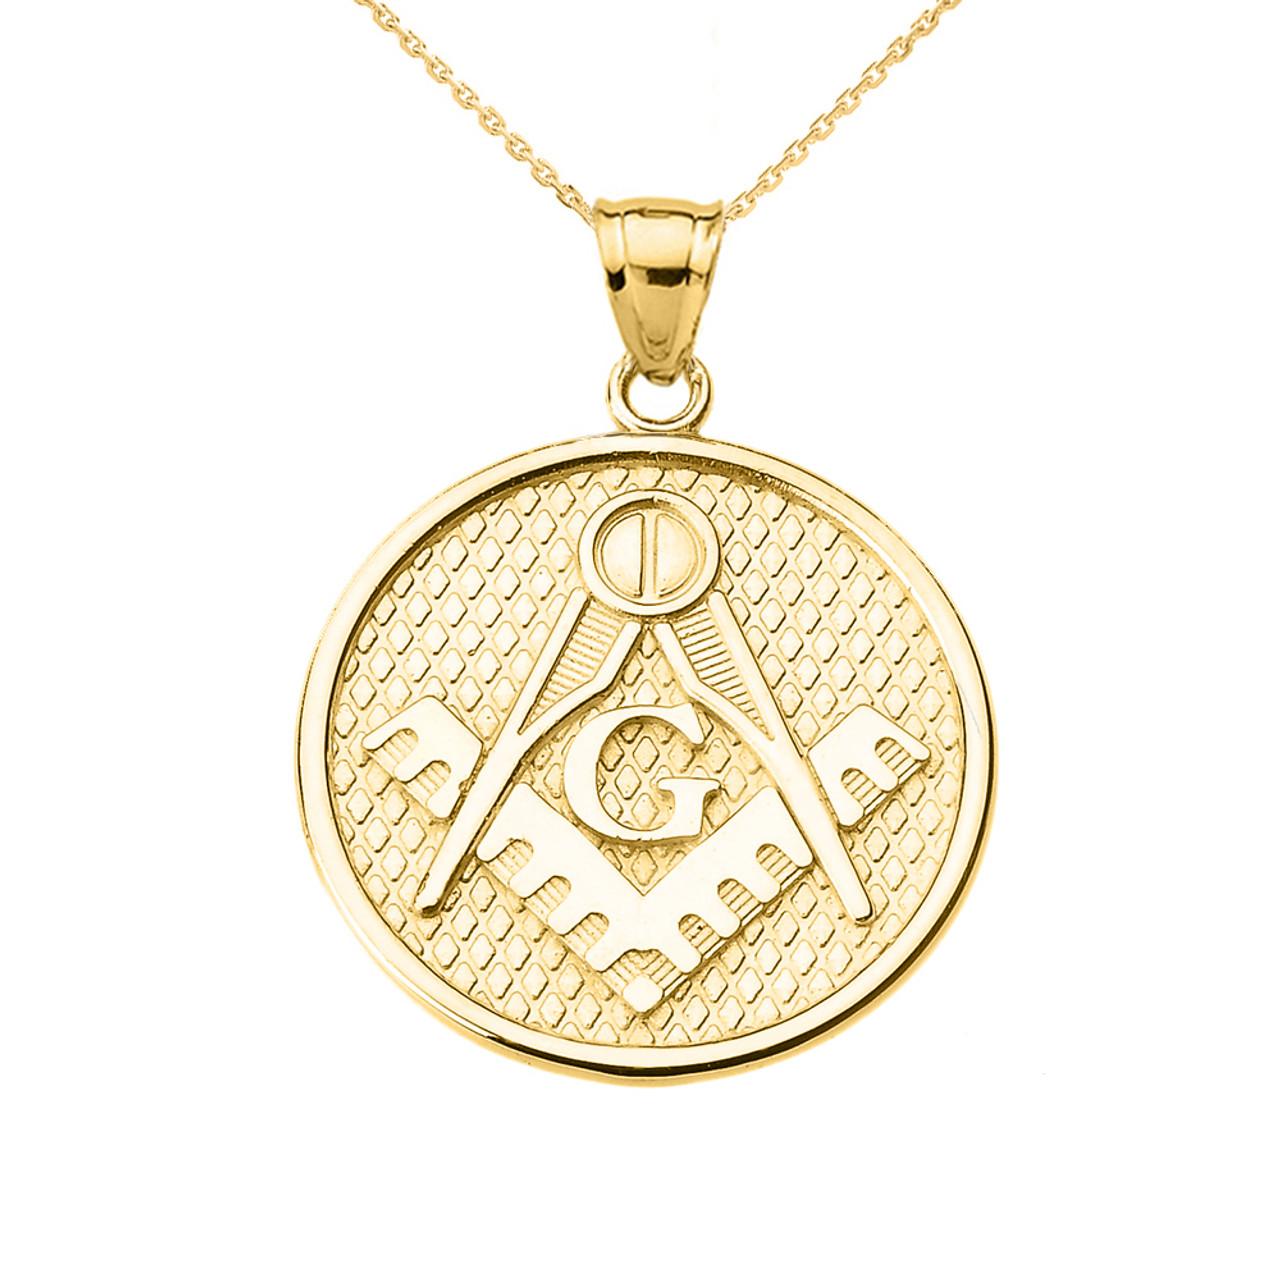 Yellow gold freemason masonic pendant necklace yellow gold freemason masonic round pendant necklace aloadofball Image collections